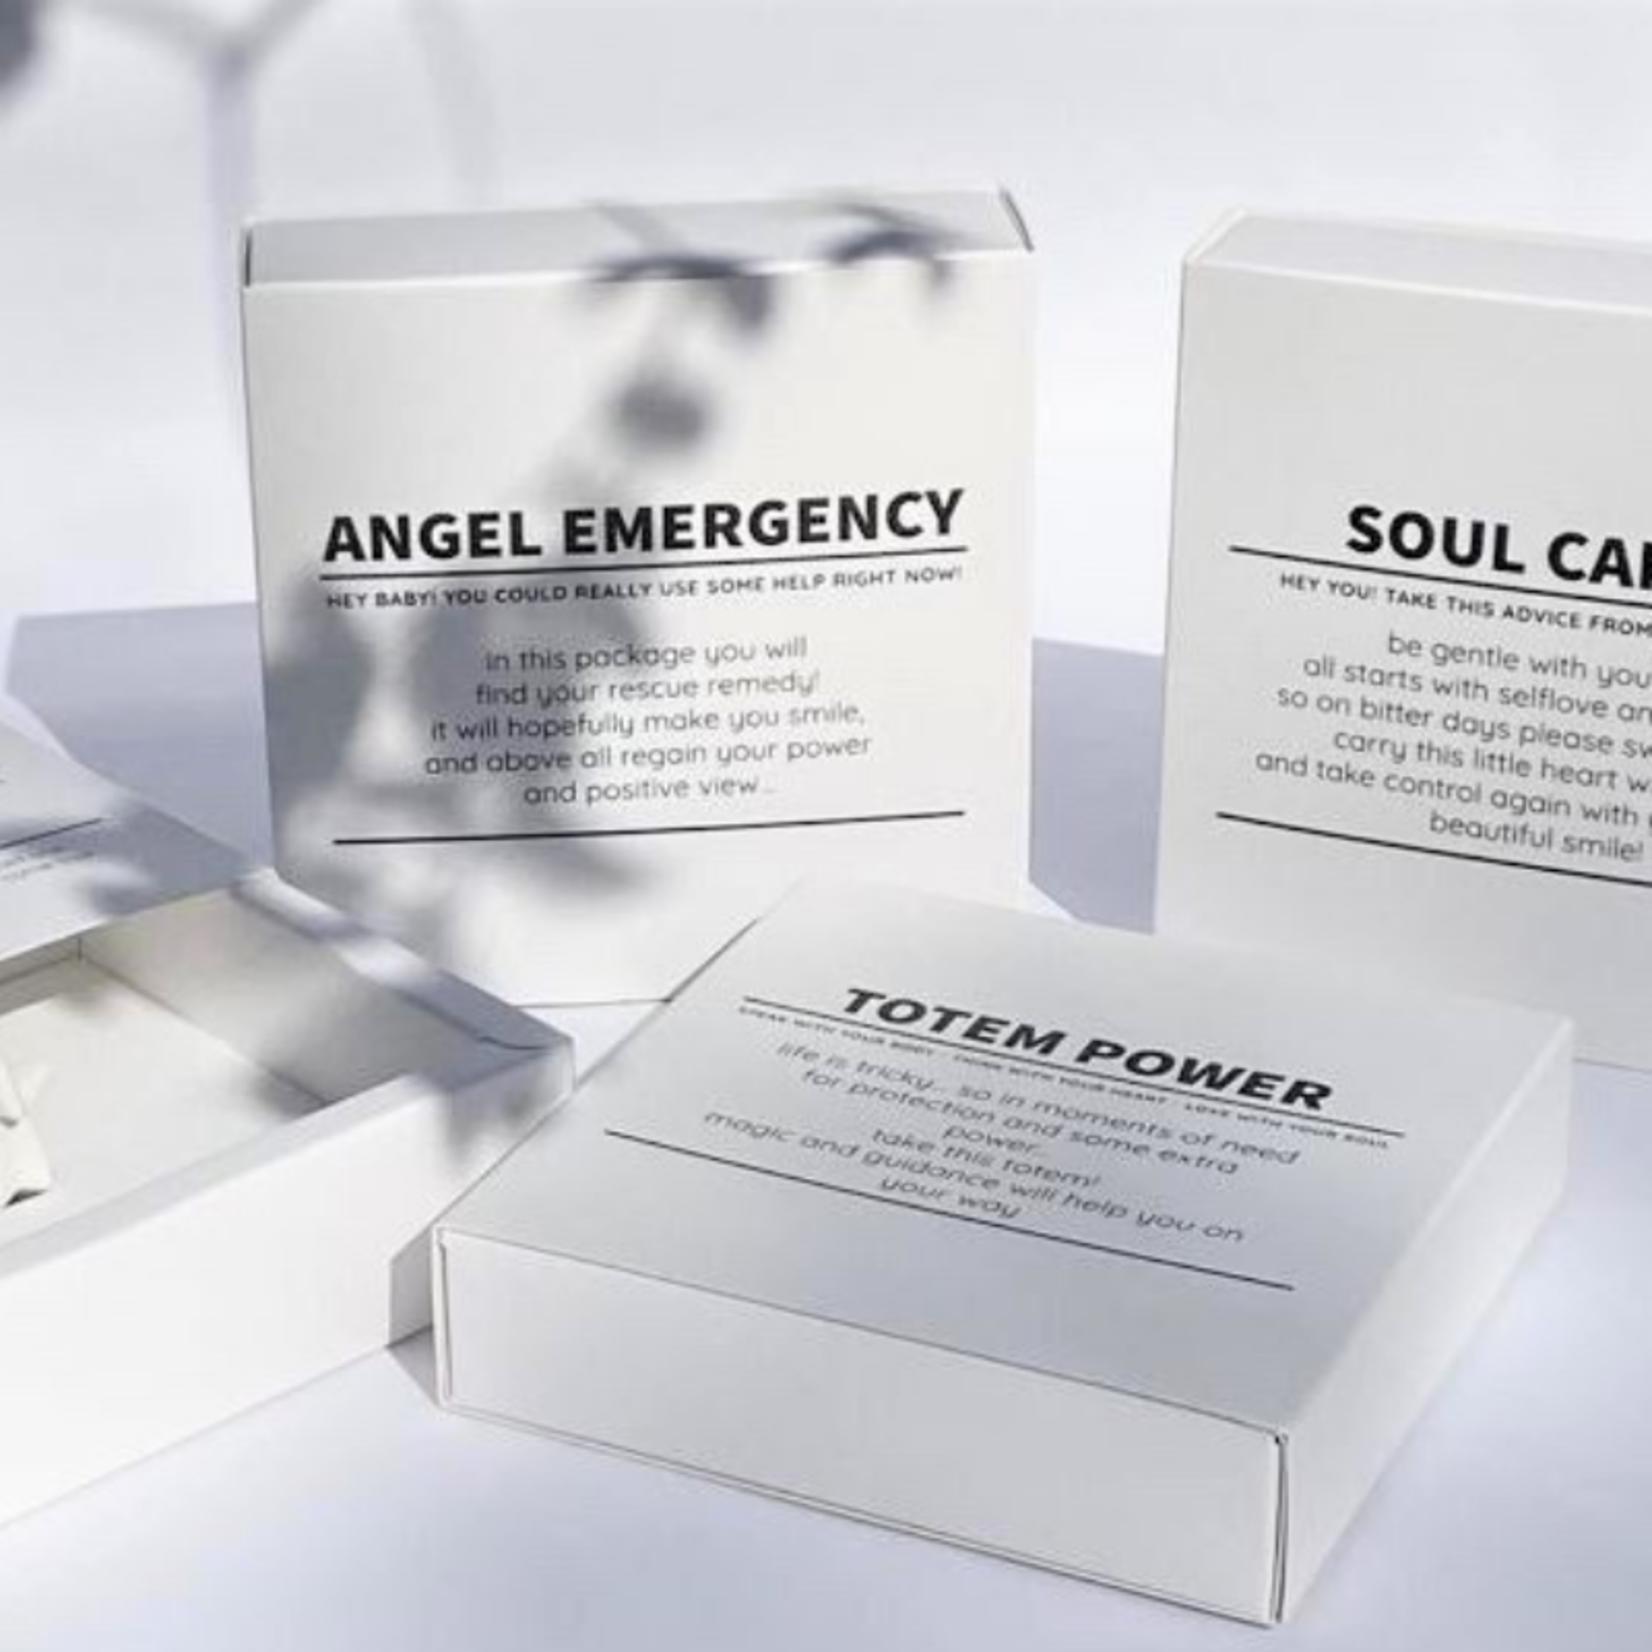 aprilmorning aprilmorning - quote box - angel emergency